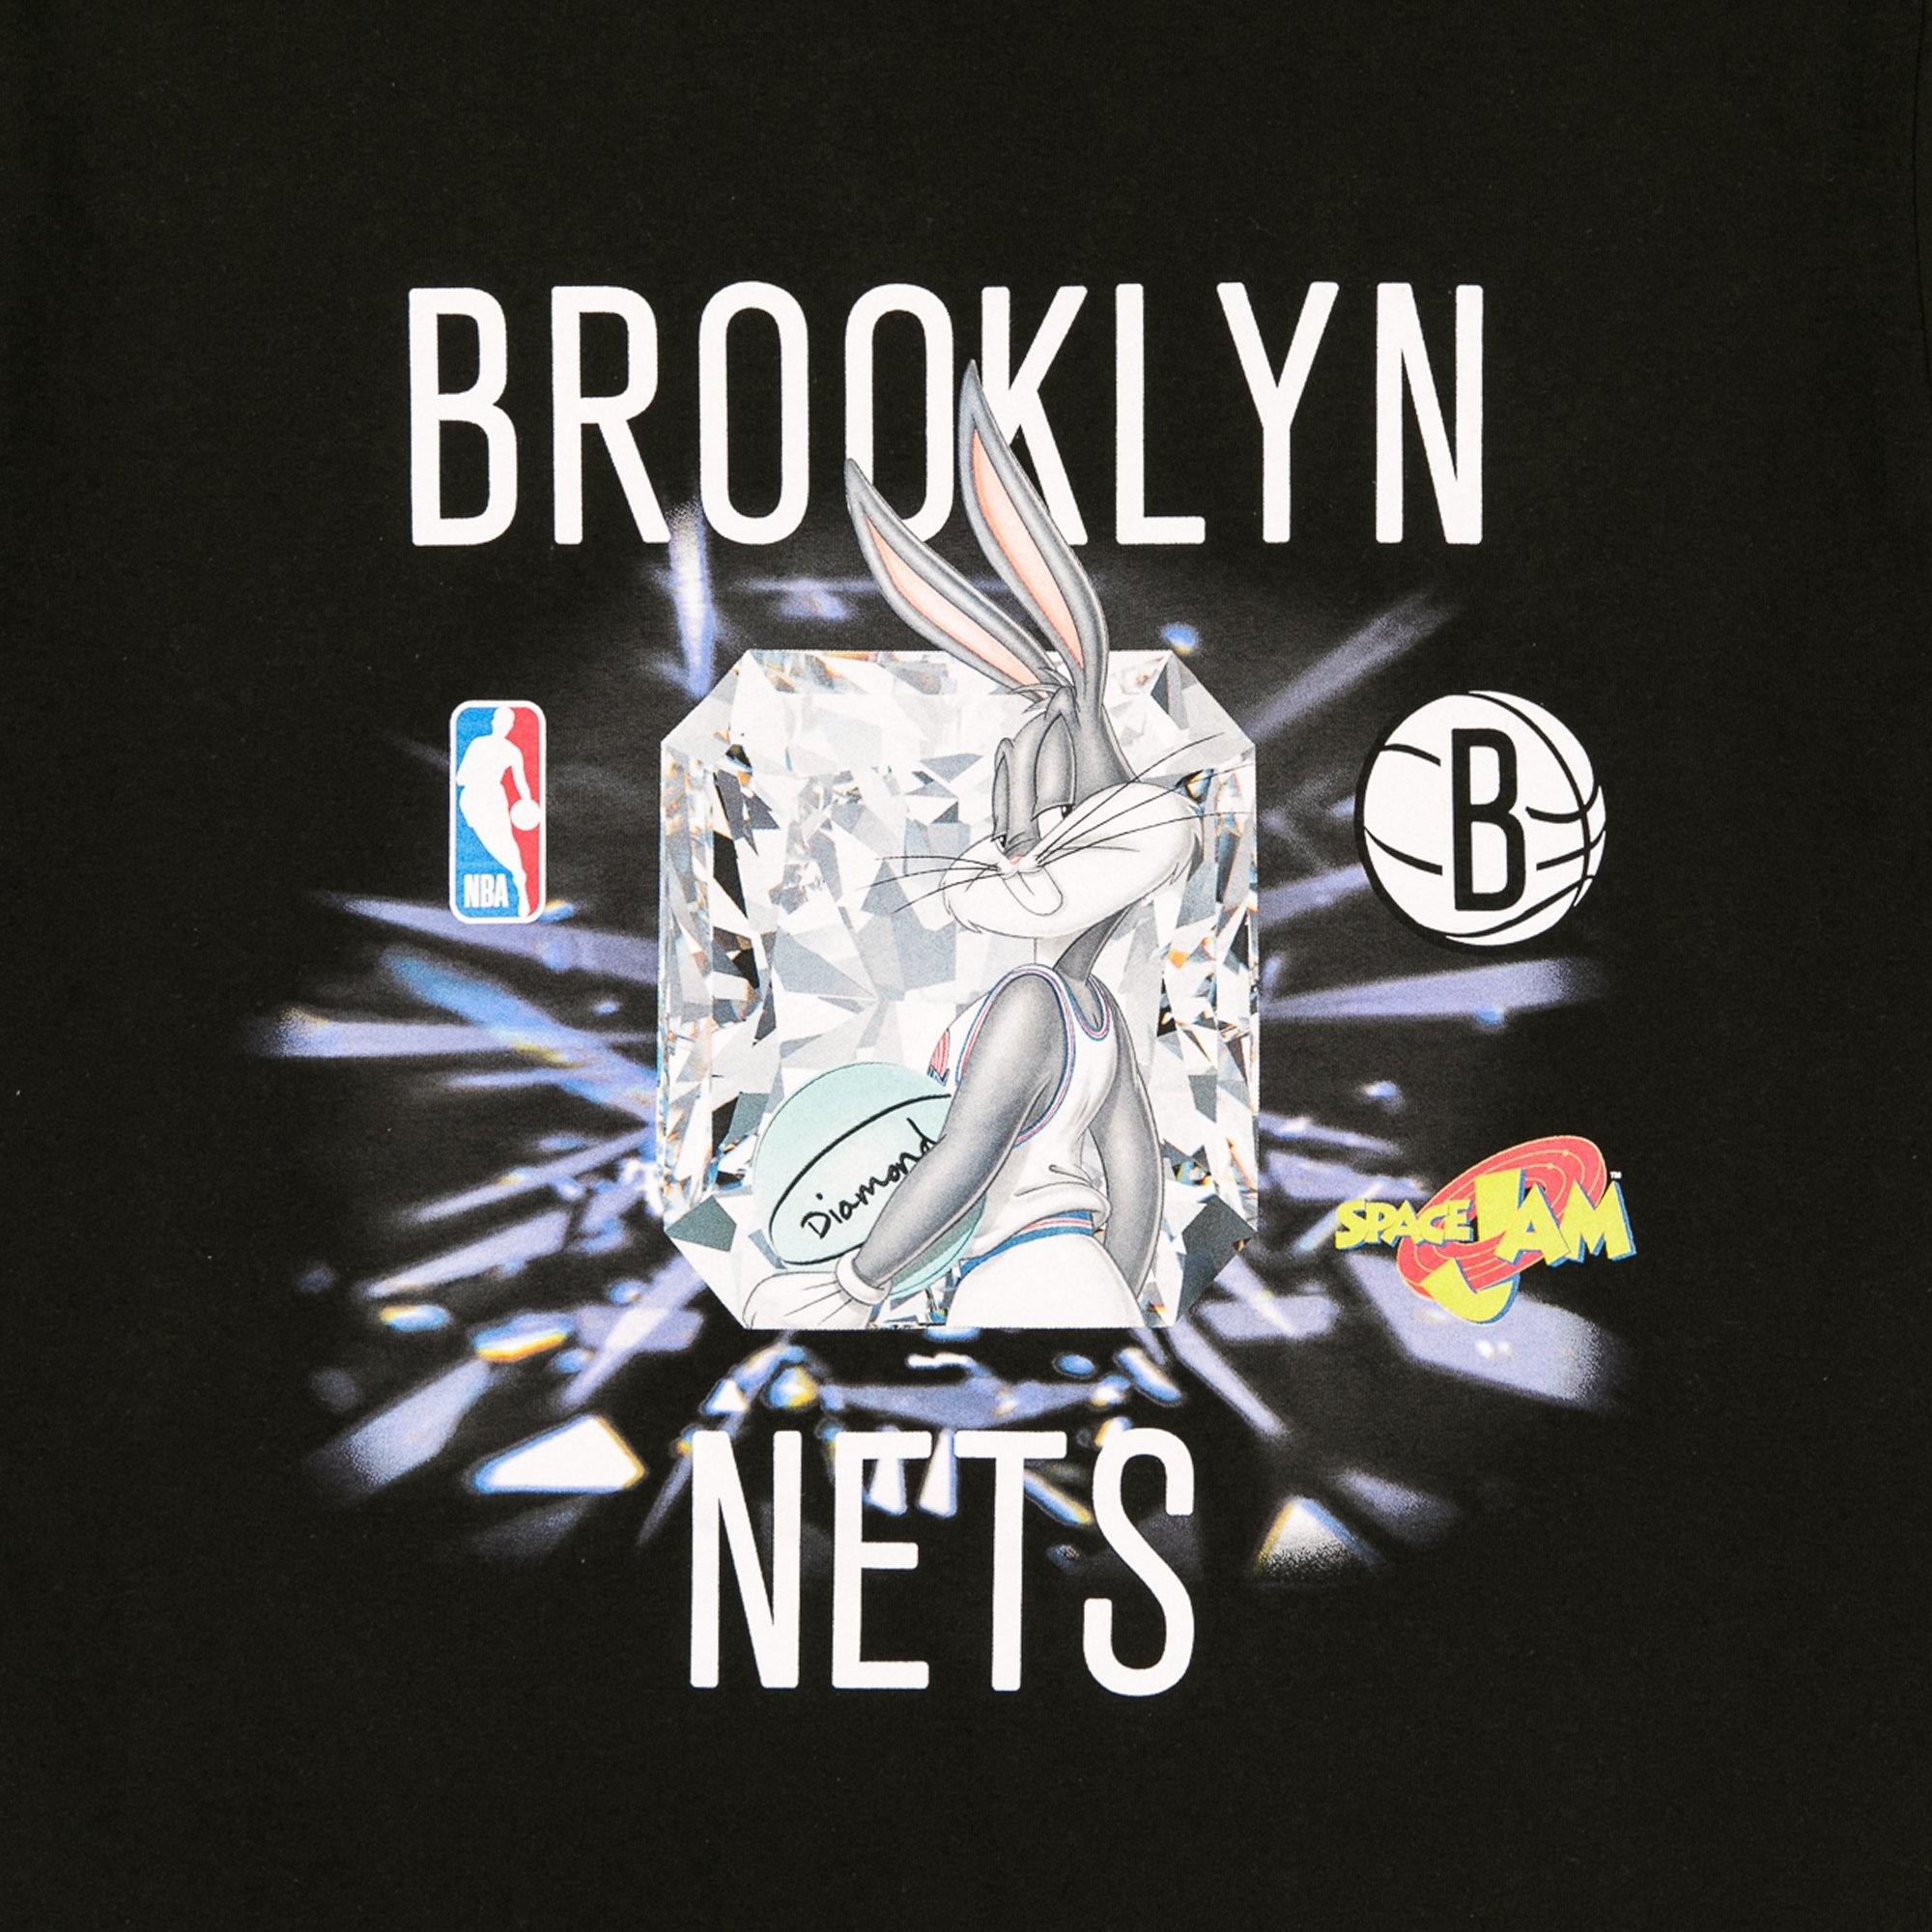 DIAMOND x SPACE JAM x NBA NETS T-SHIRT